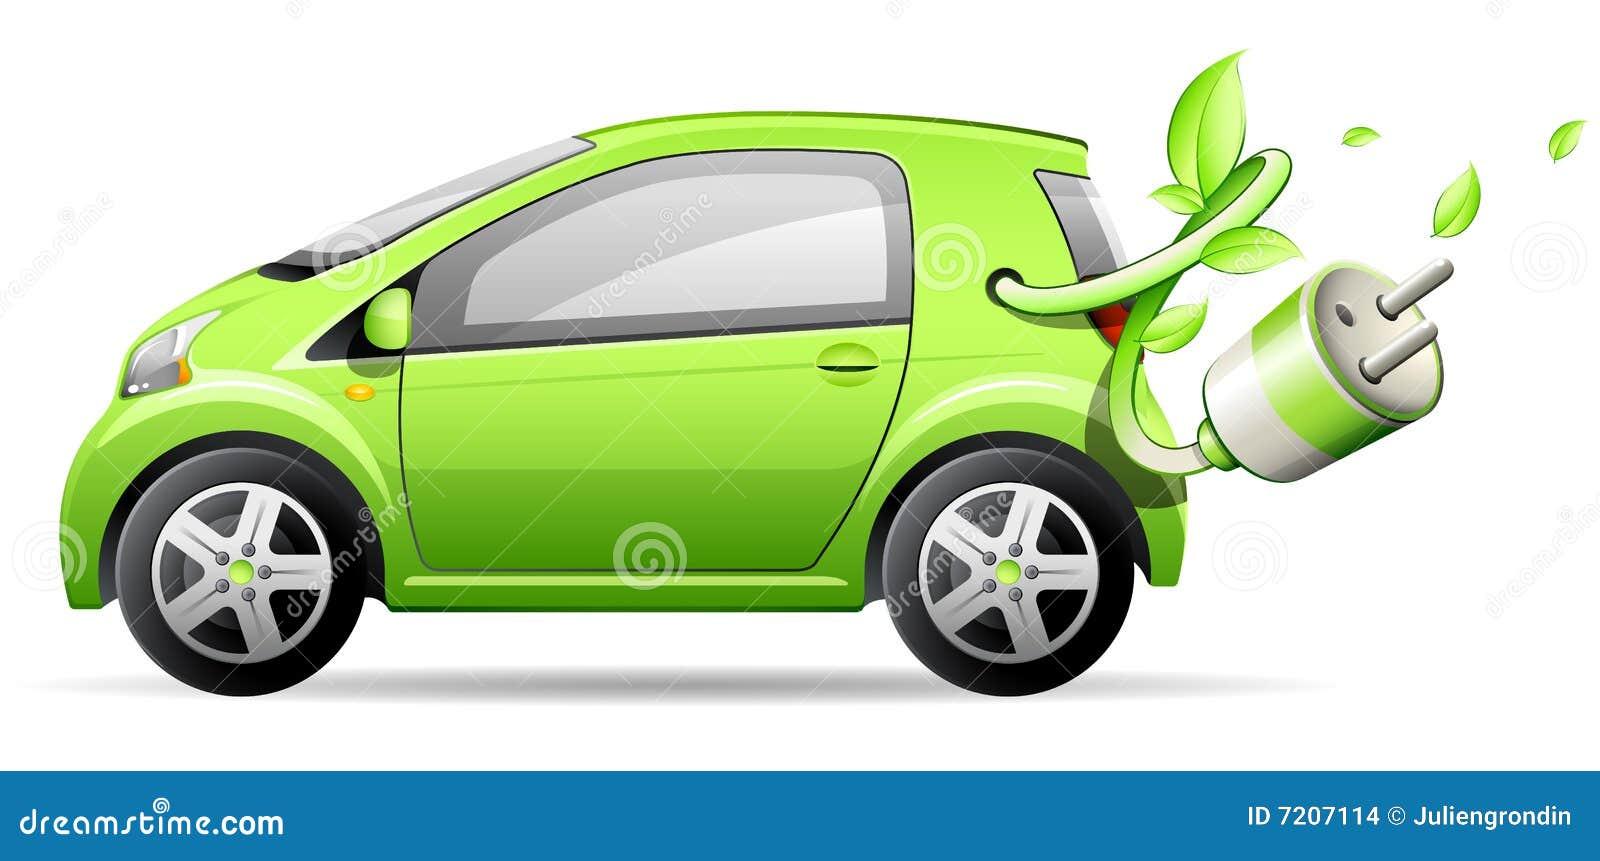 Carro elétrico verde